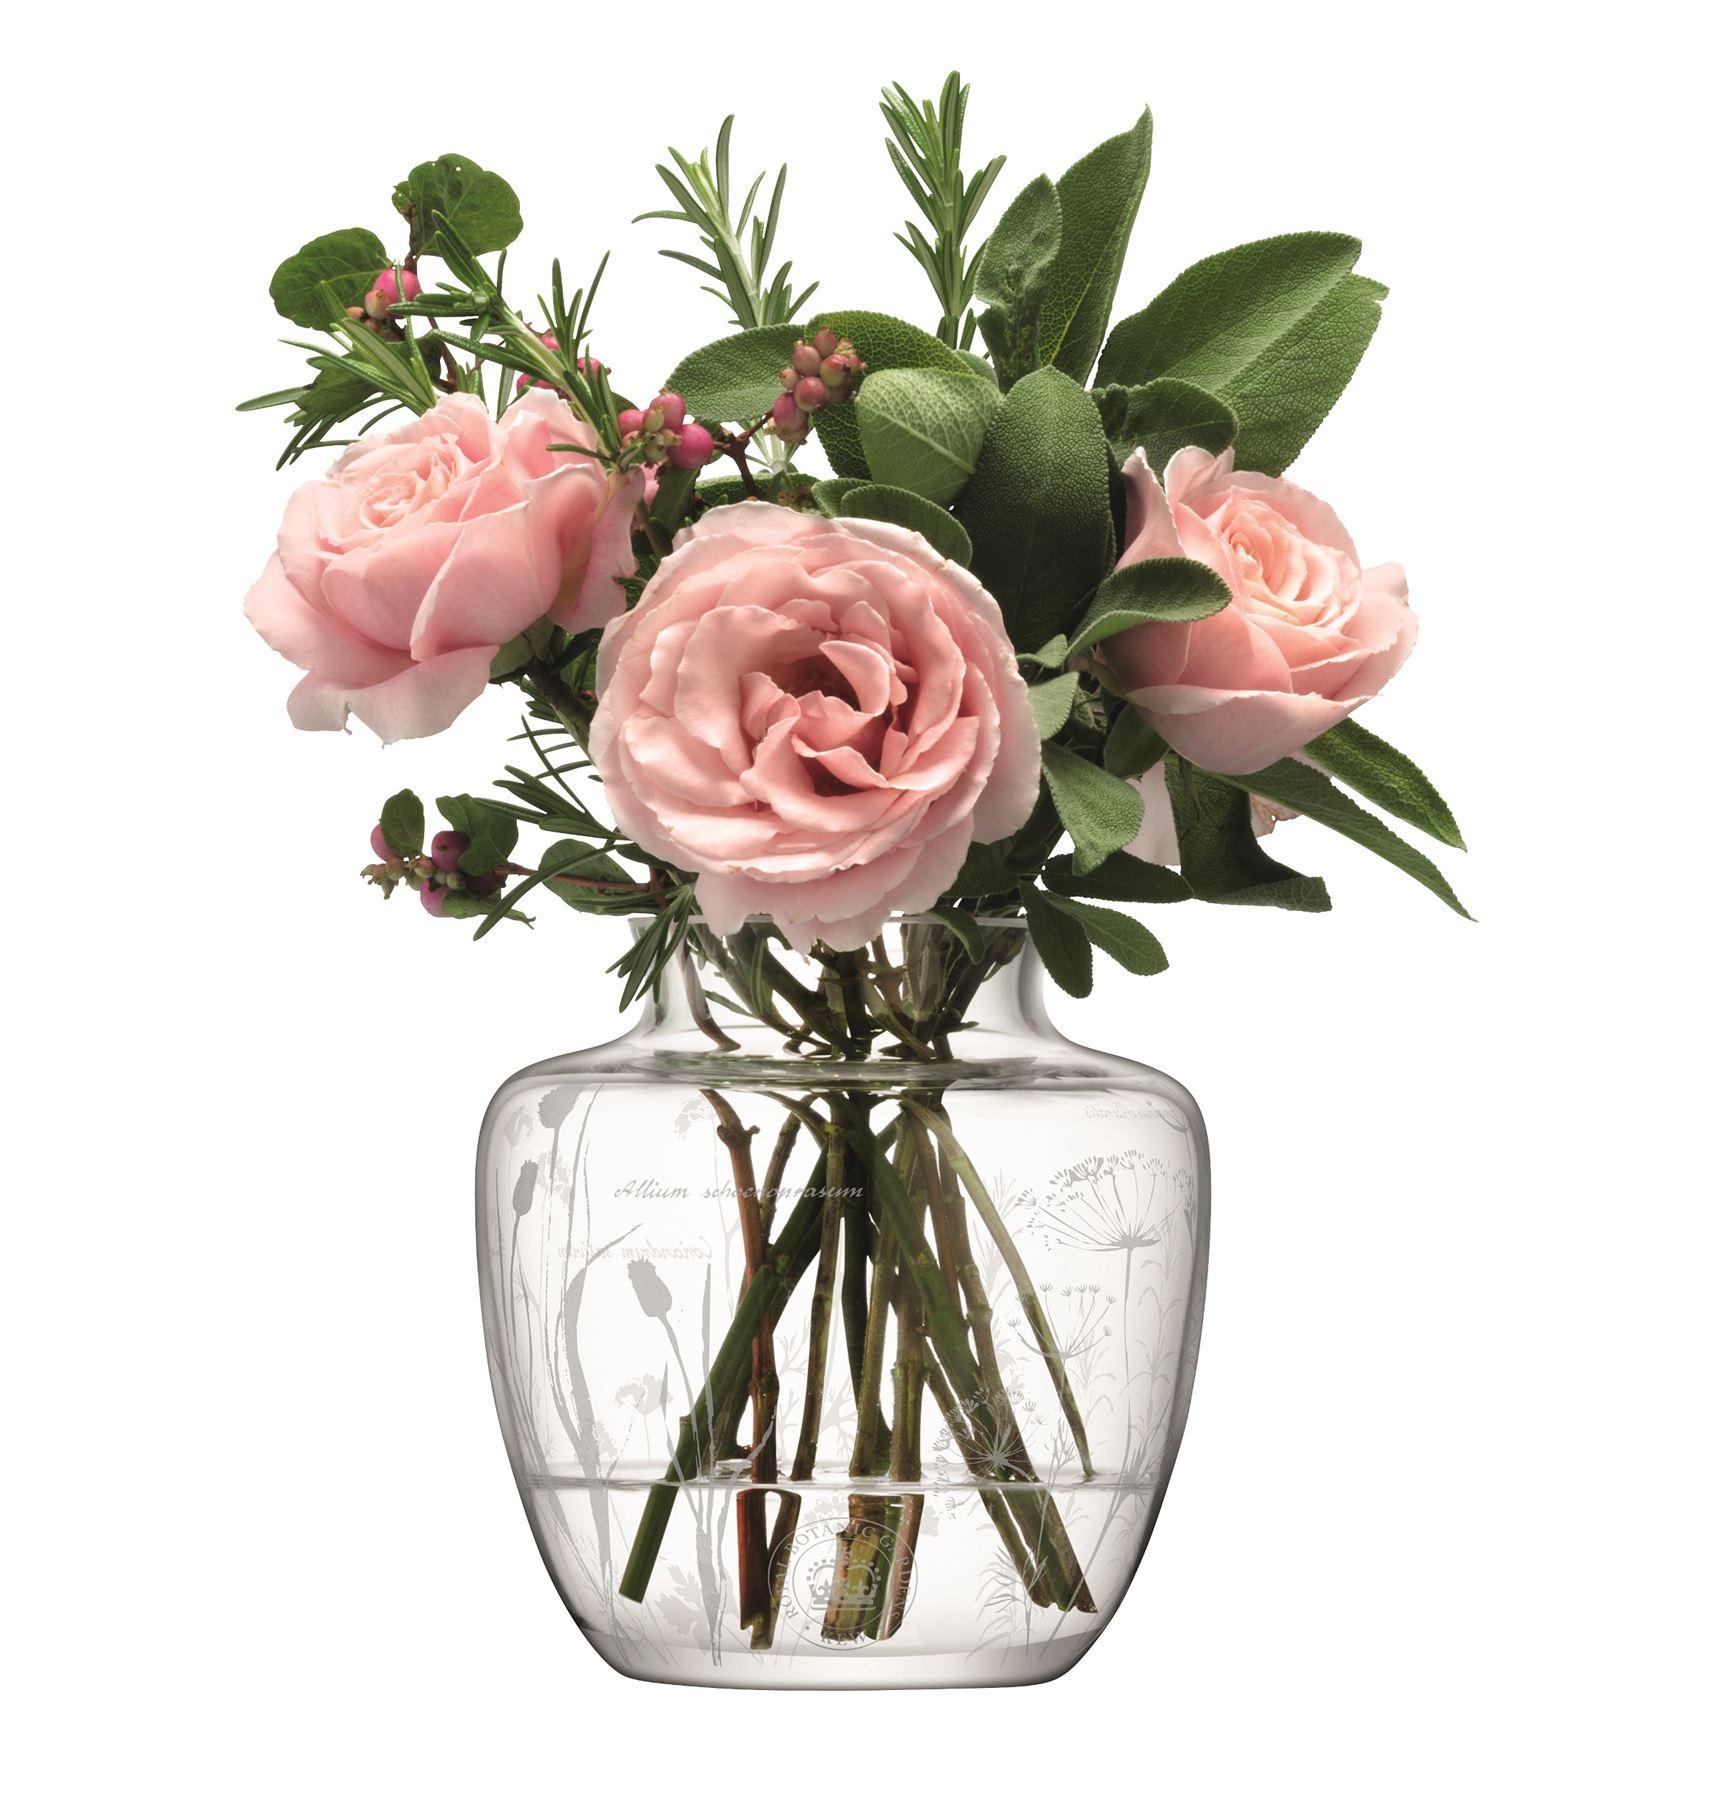 LSA Kew Gardens Glass Vase with Etched Herb Floral Design